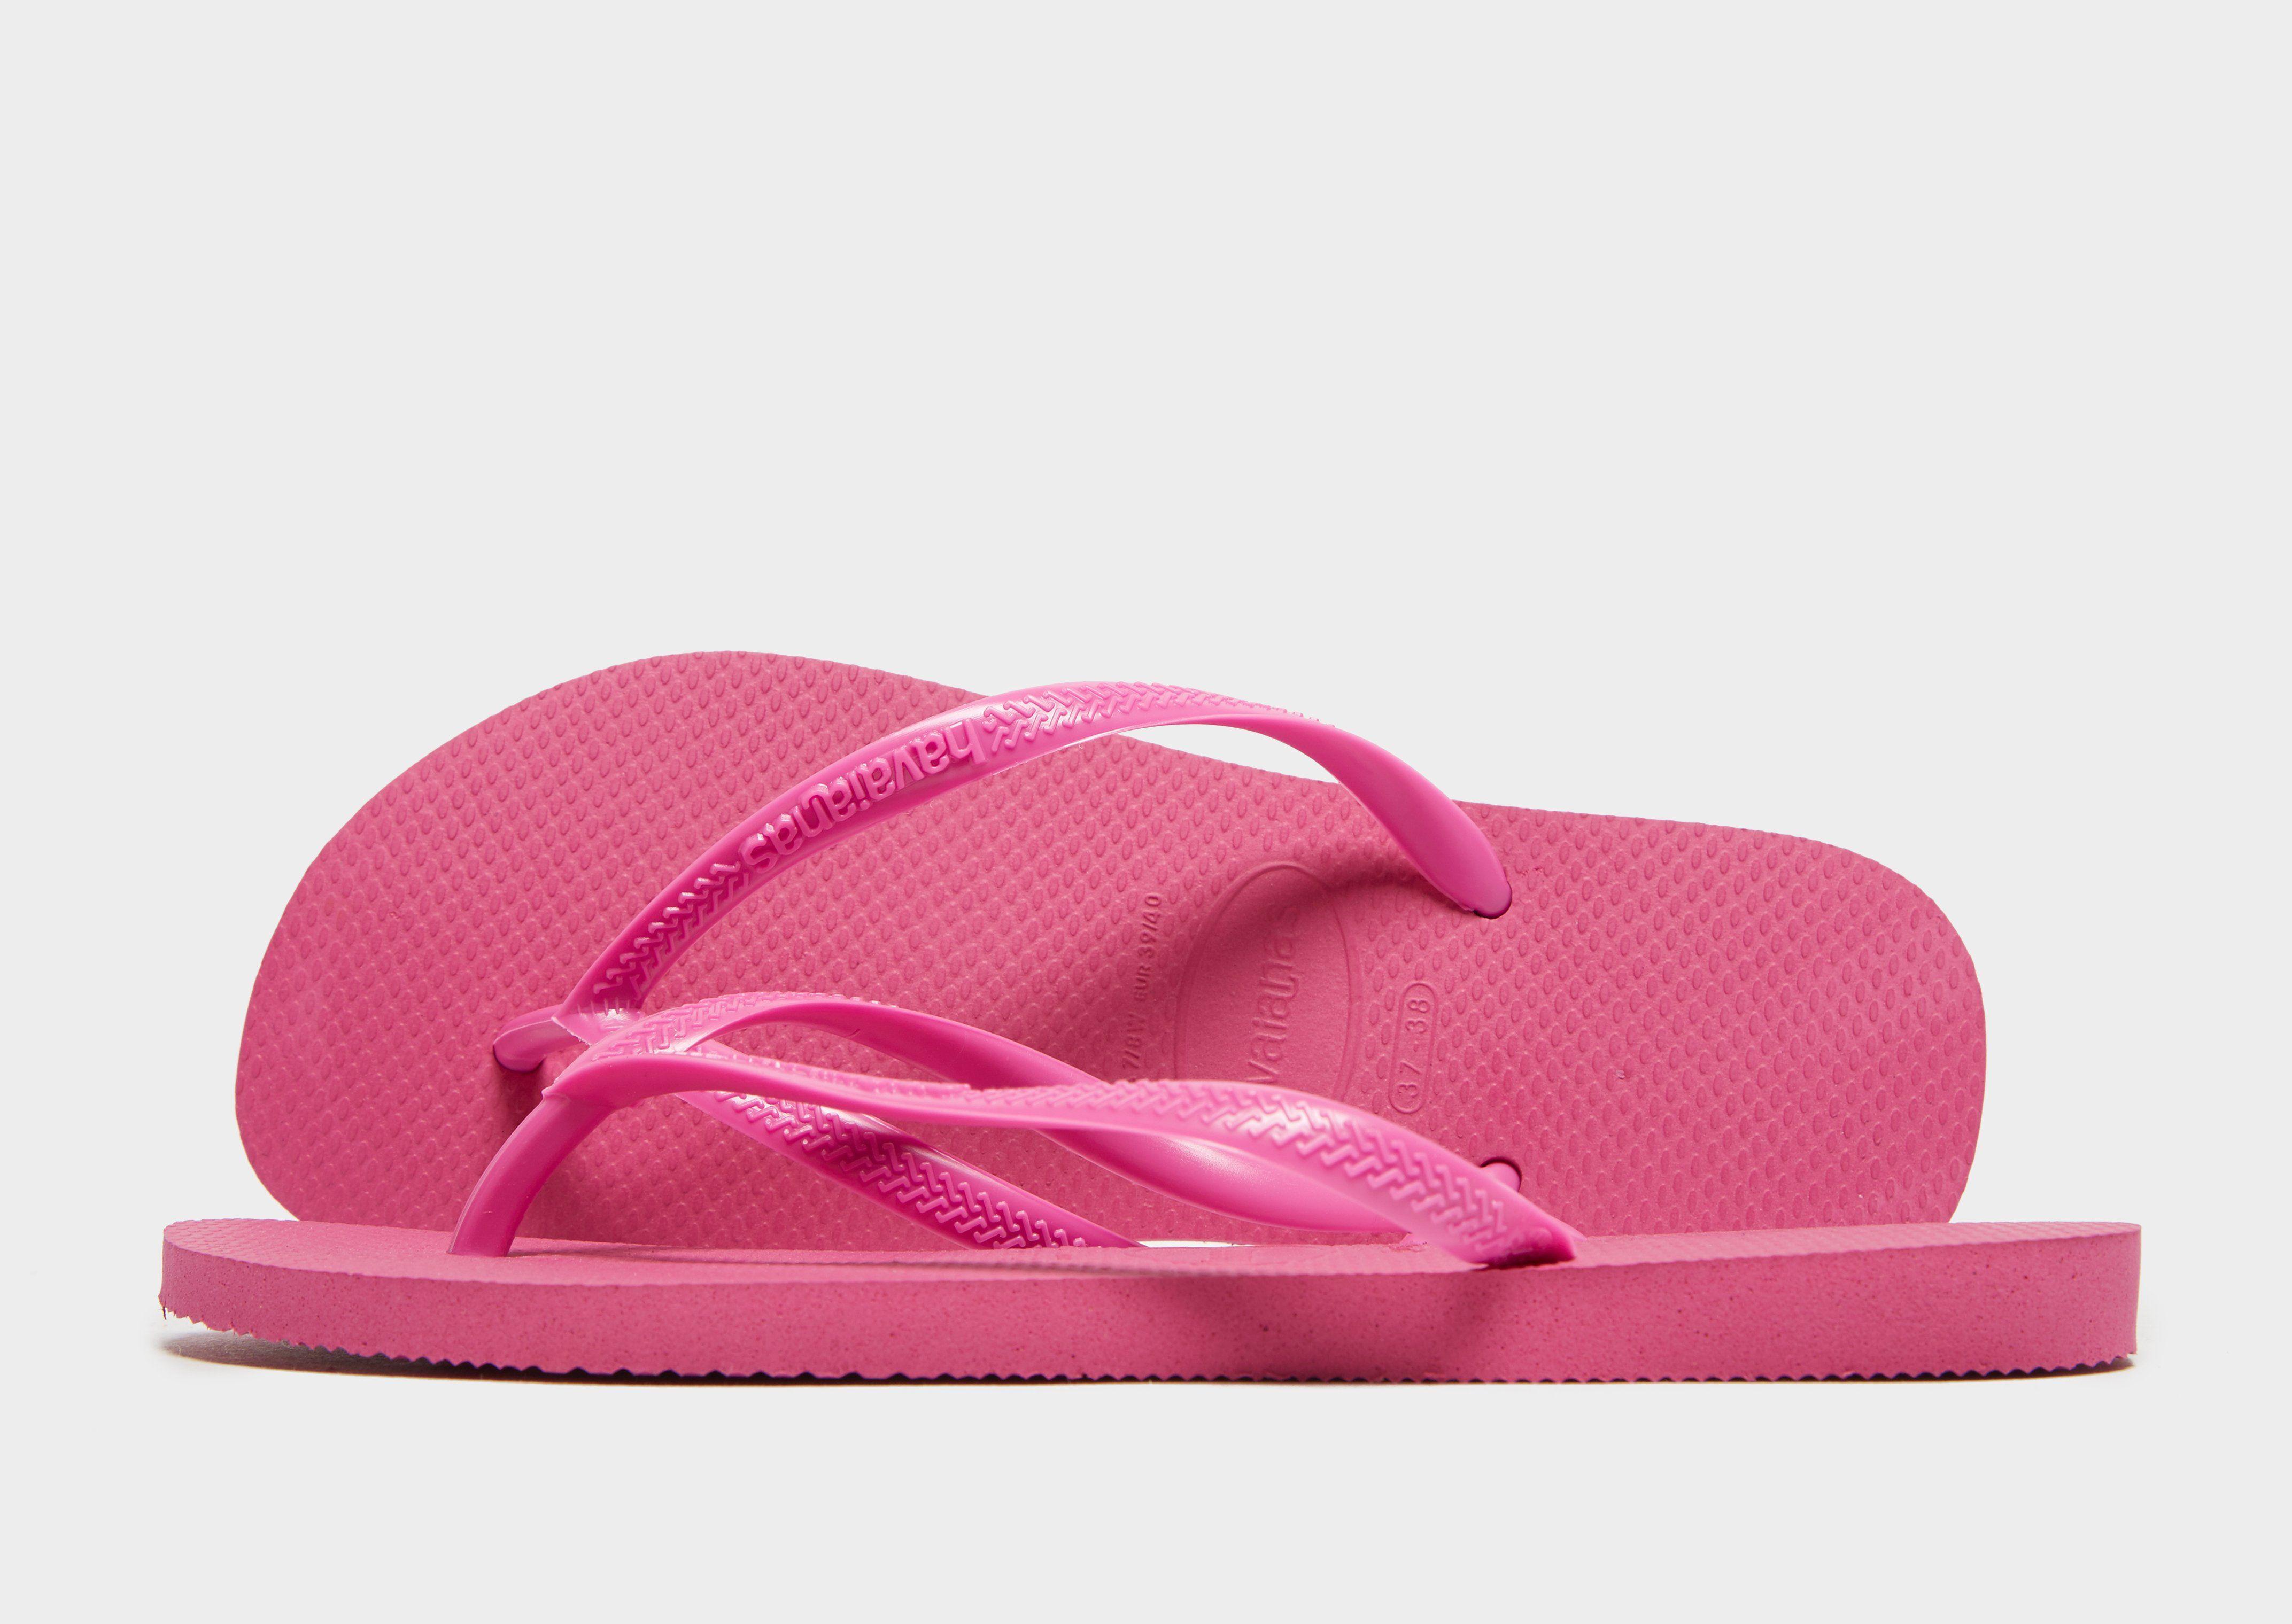 4da5496a6acc Havaianas Slim Flip Flops Women s